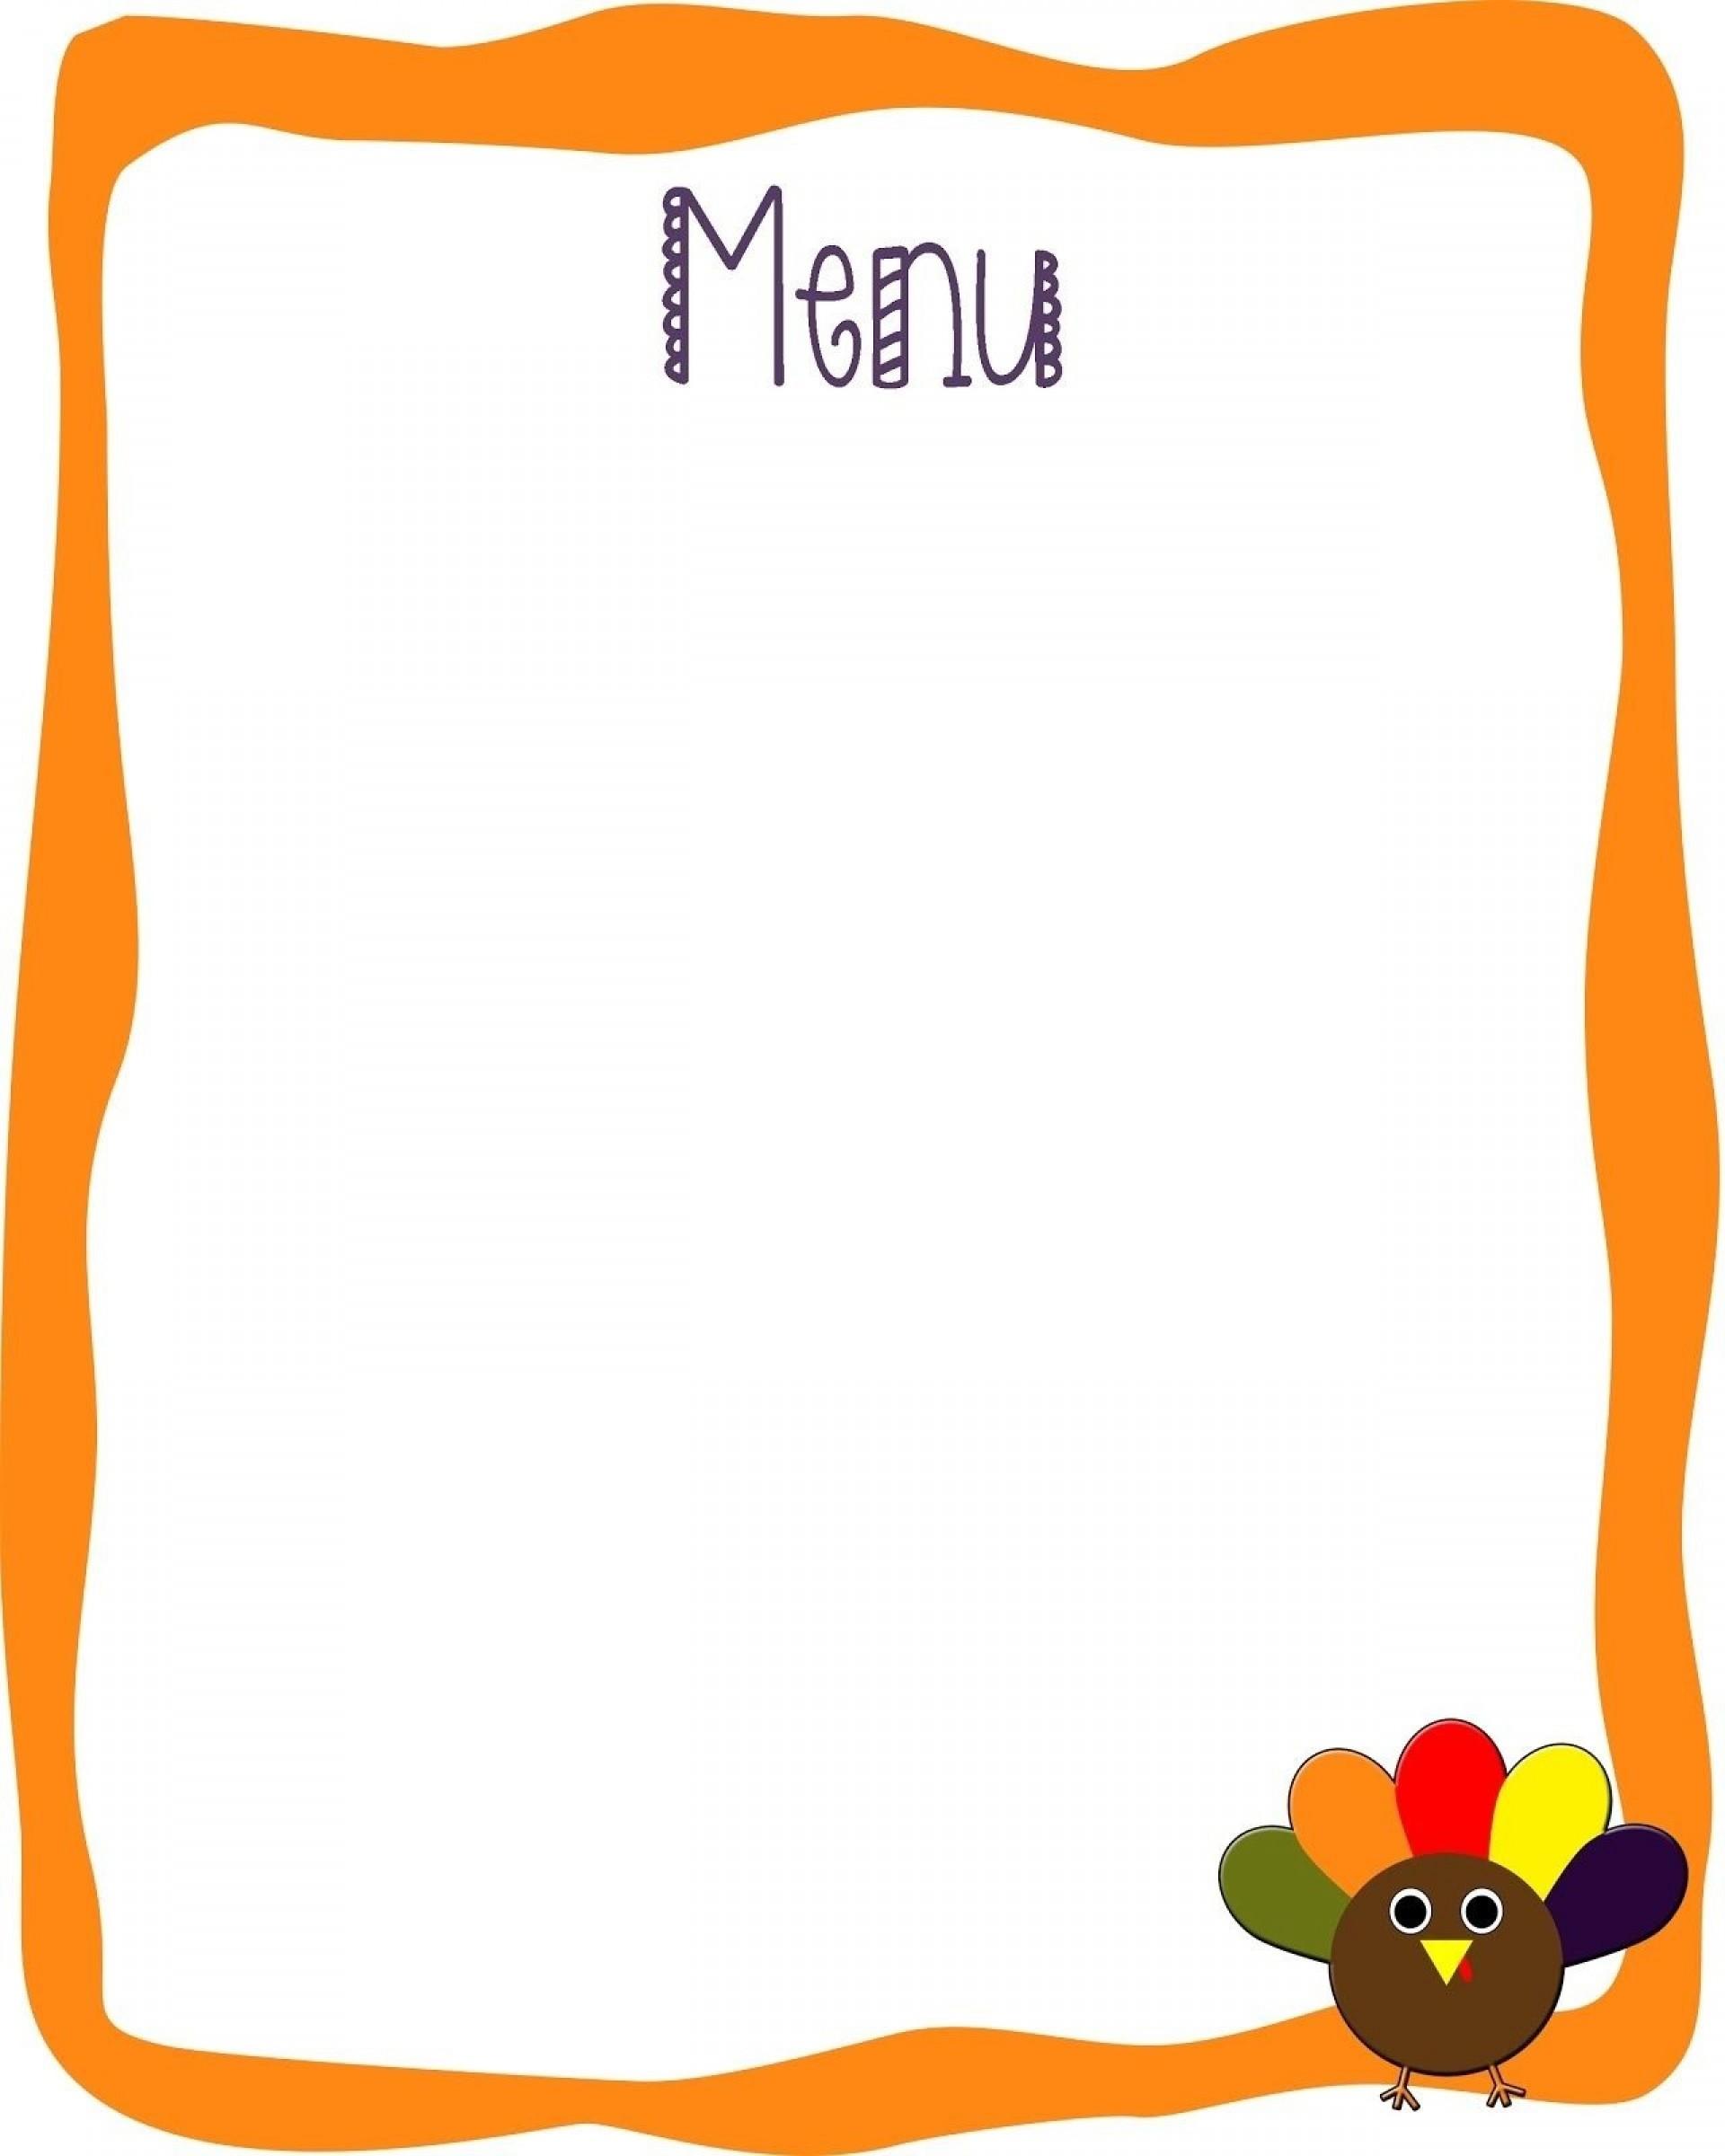 000 Unique Blank Restaurant Menu Template Highest Quality  Free Printable Downloadable1920